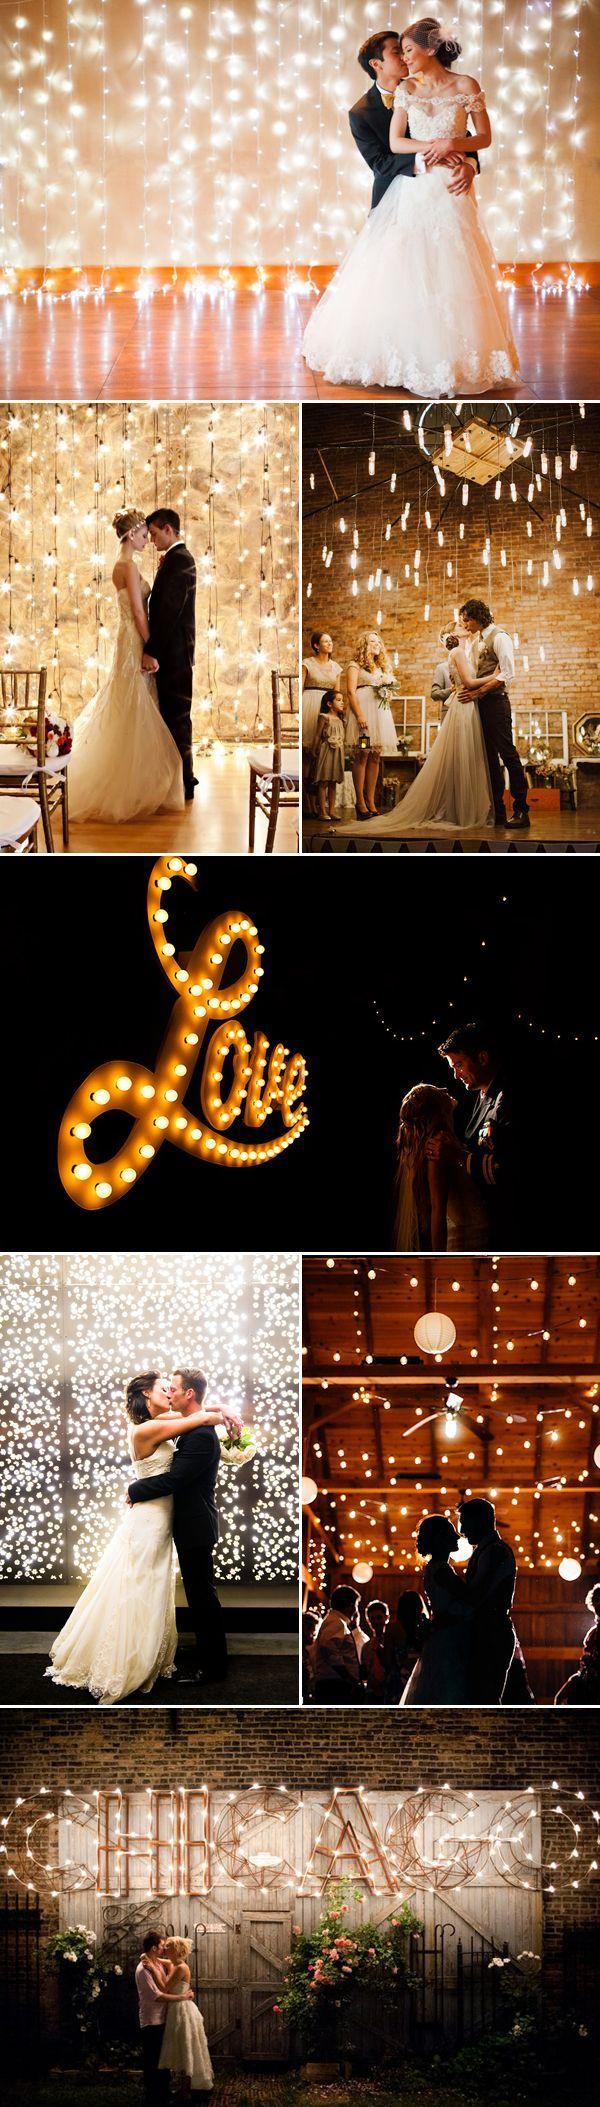 16 Magical Lighted Wedding Backdrop Wedding reception